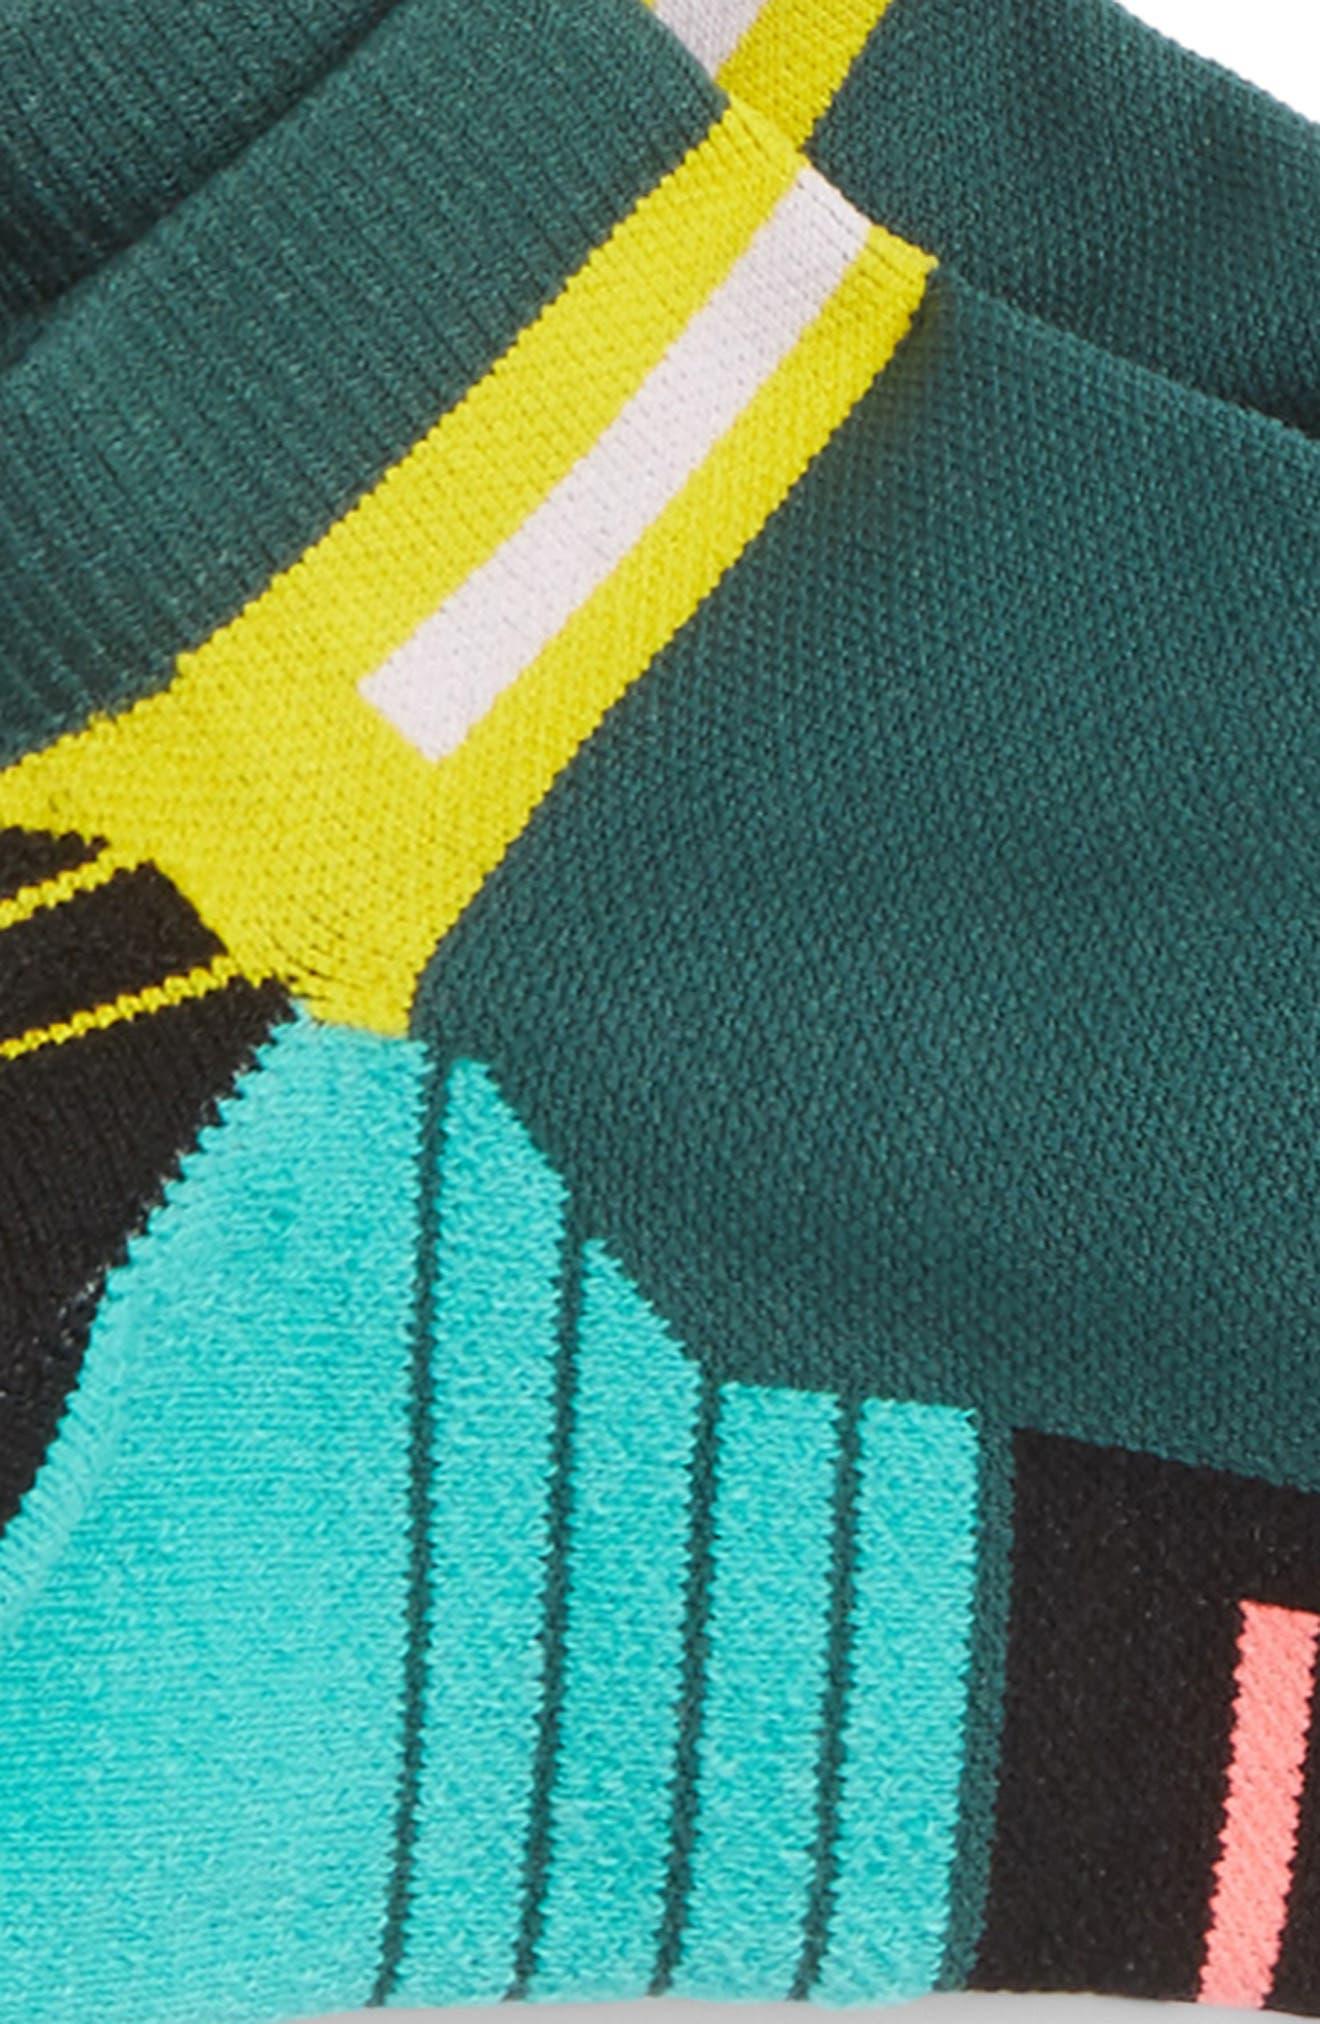 Manoa Tab Ankle Socks,                             Alternate thumbnail 2, color,                             340